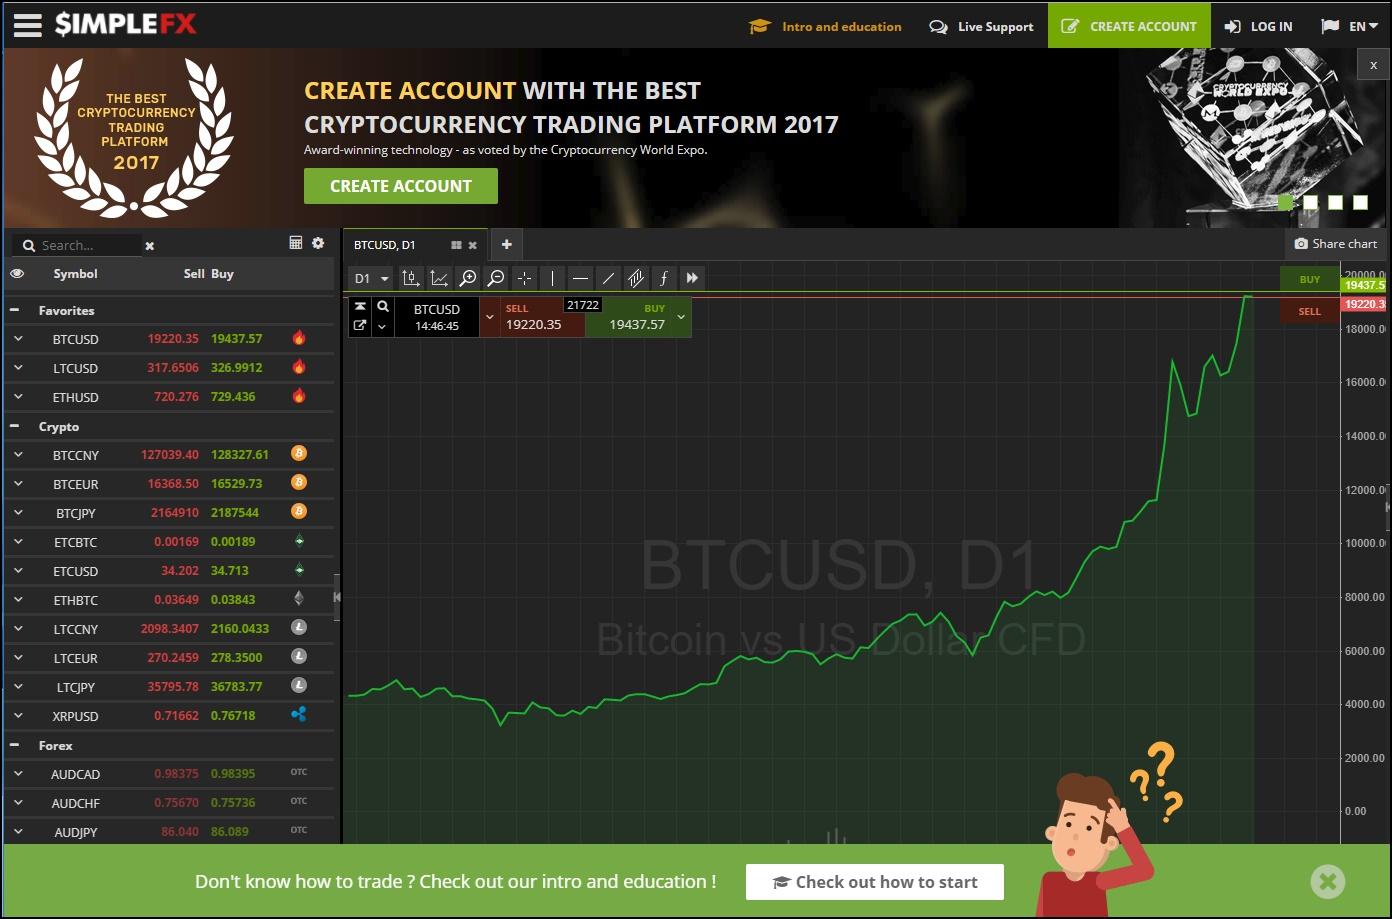 Simple FXのMT4口座でビットコイン他仮想通貨チャートトレードをする方法 | FX検証ブログキング-勝ち方と